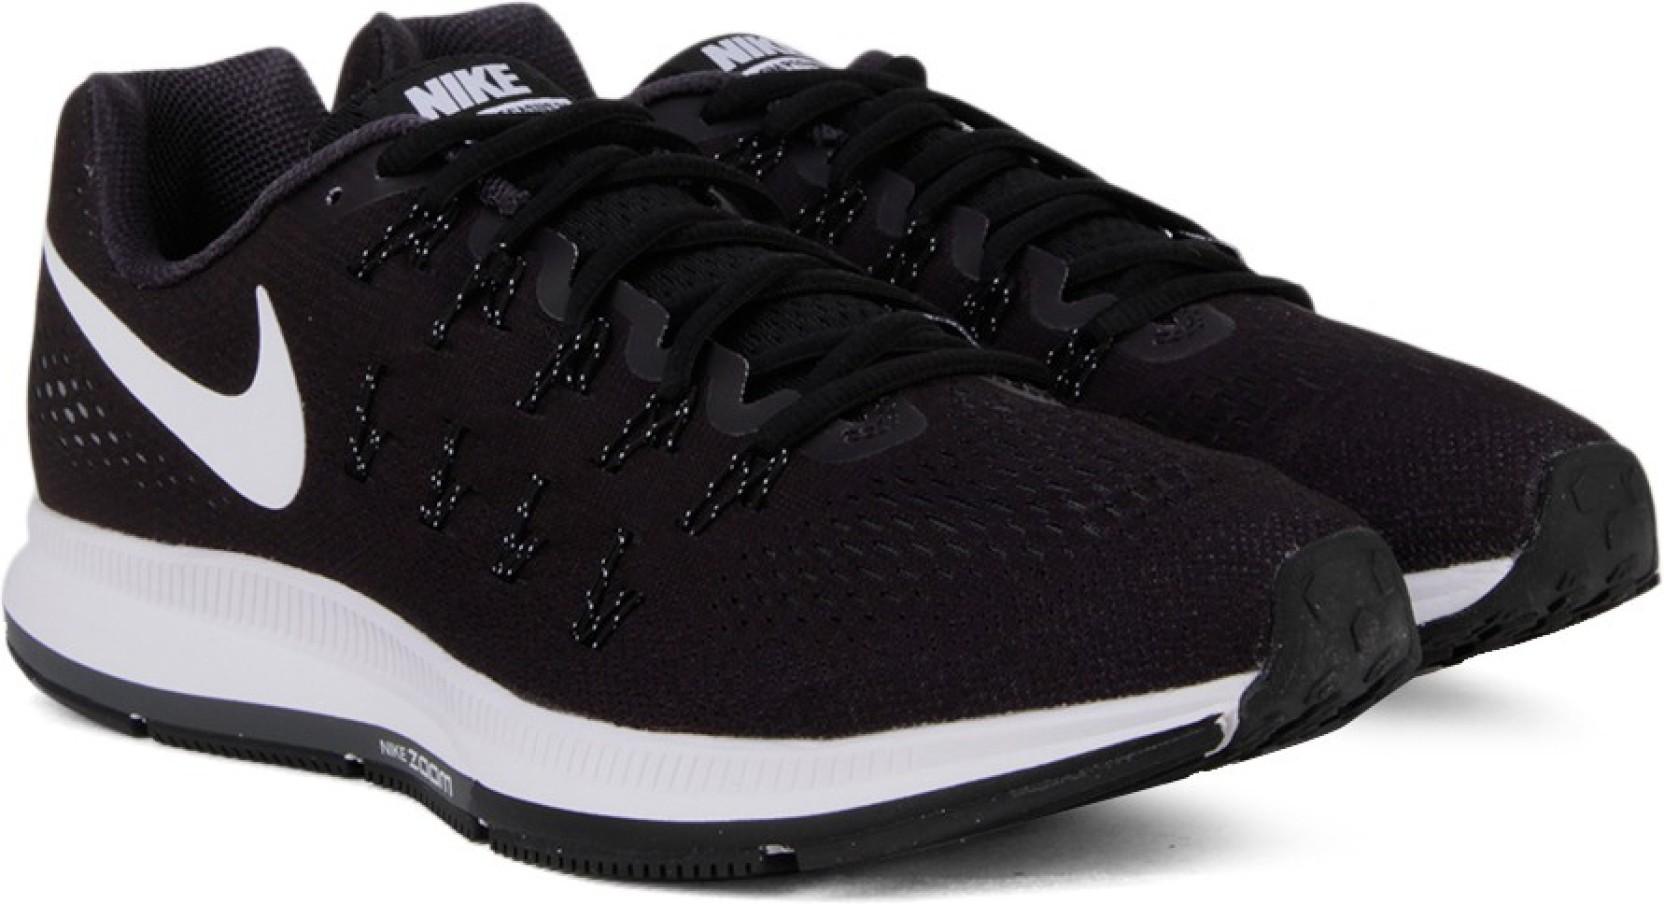 best authentic c5d61 e1841 Nike AIR ZOOM PEGASUS 33 Running Shoes For Men